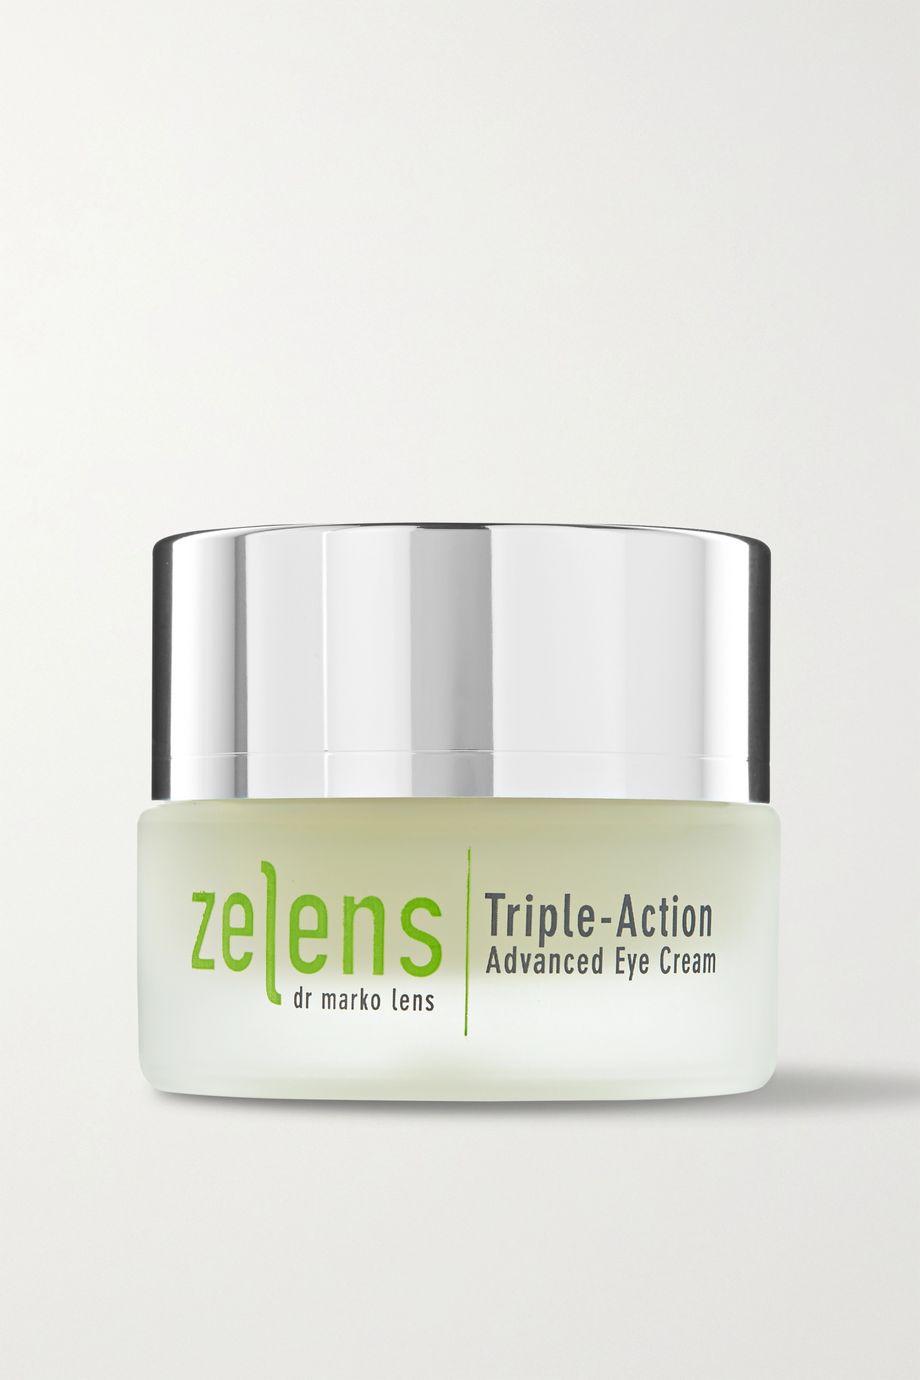 Zelens Triple Action Advanced Eye Cream, 15ml